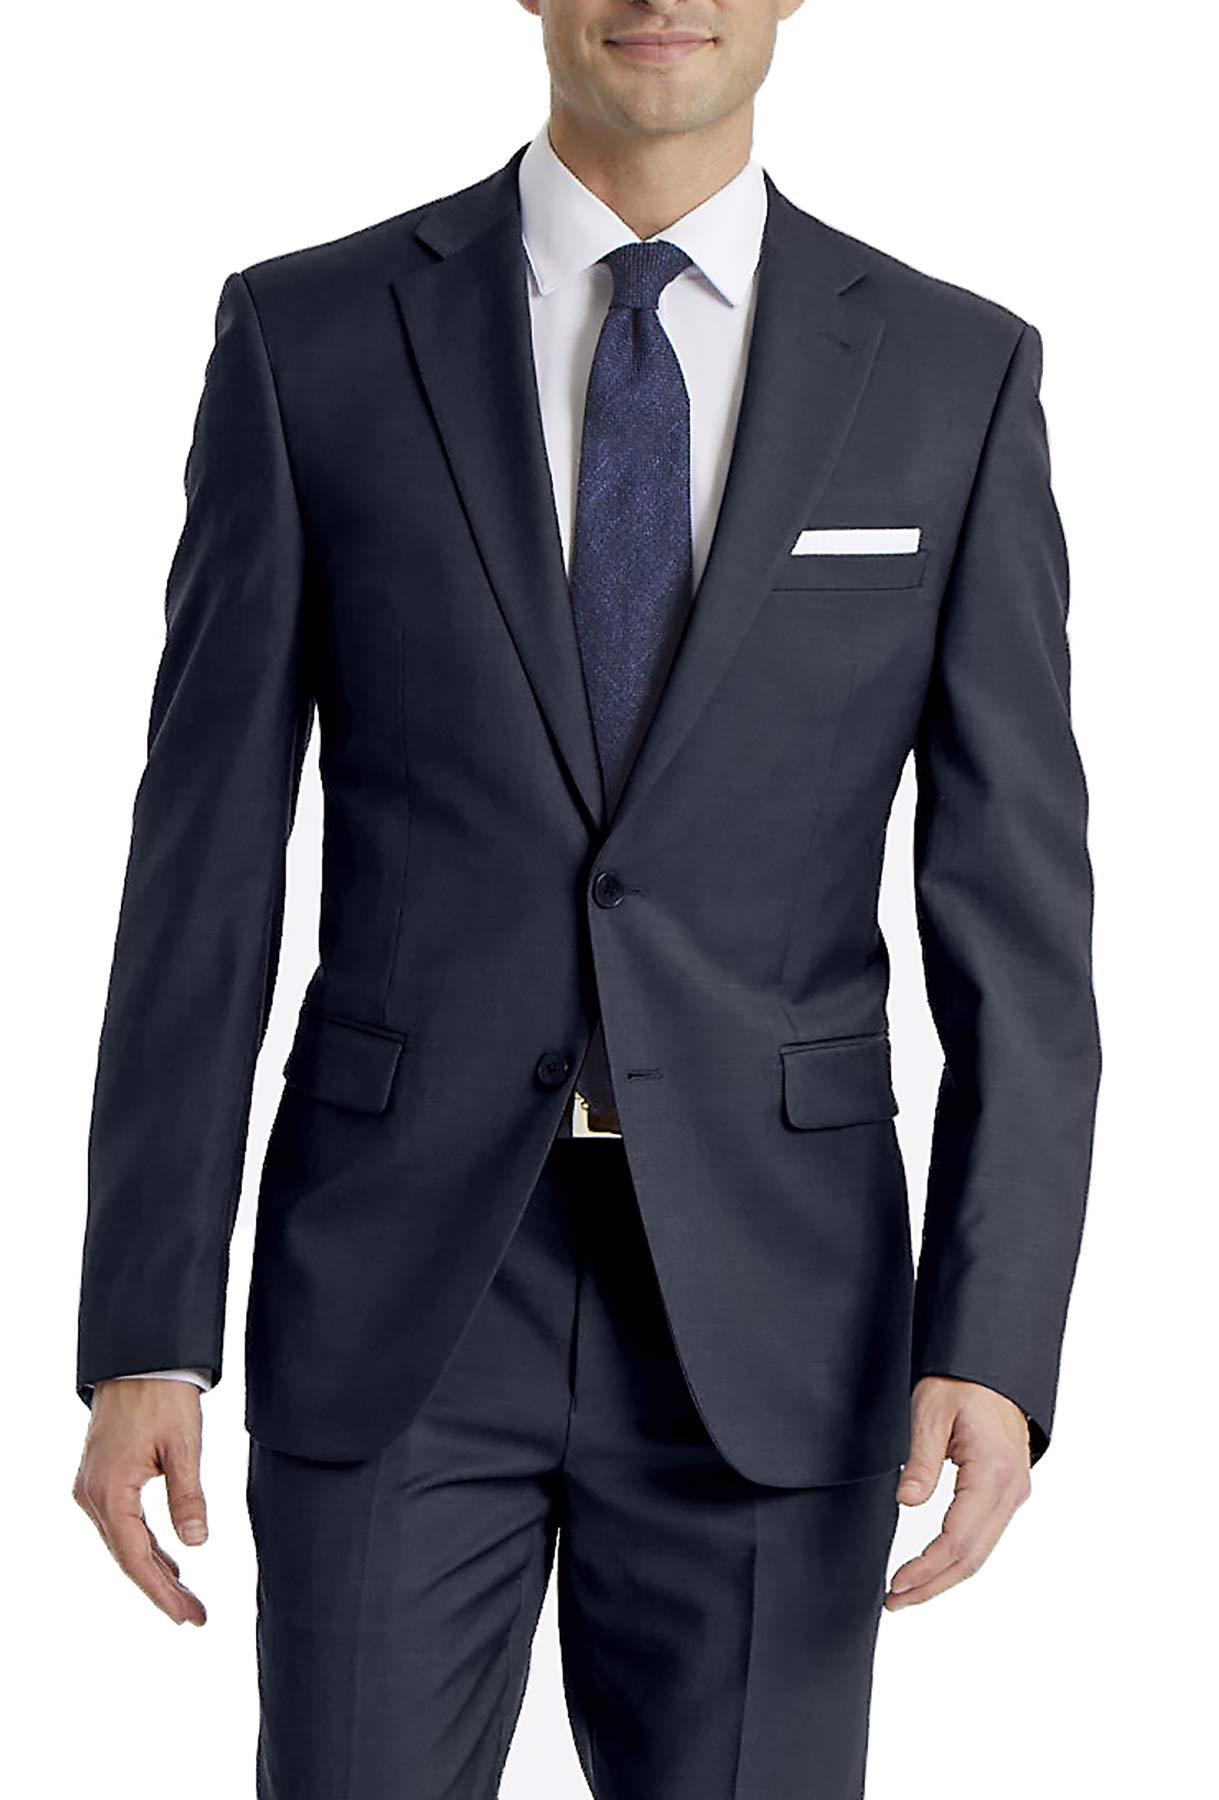 Calvin Klein Men's X-Fit Slim Stretch Suit Separate Blazer (Blazer and Pant), Navy, 38 Regular